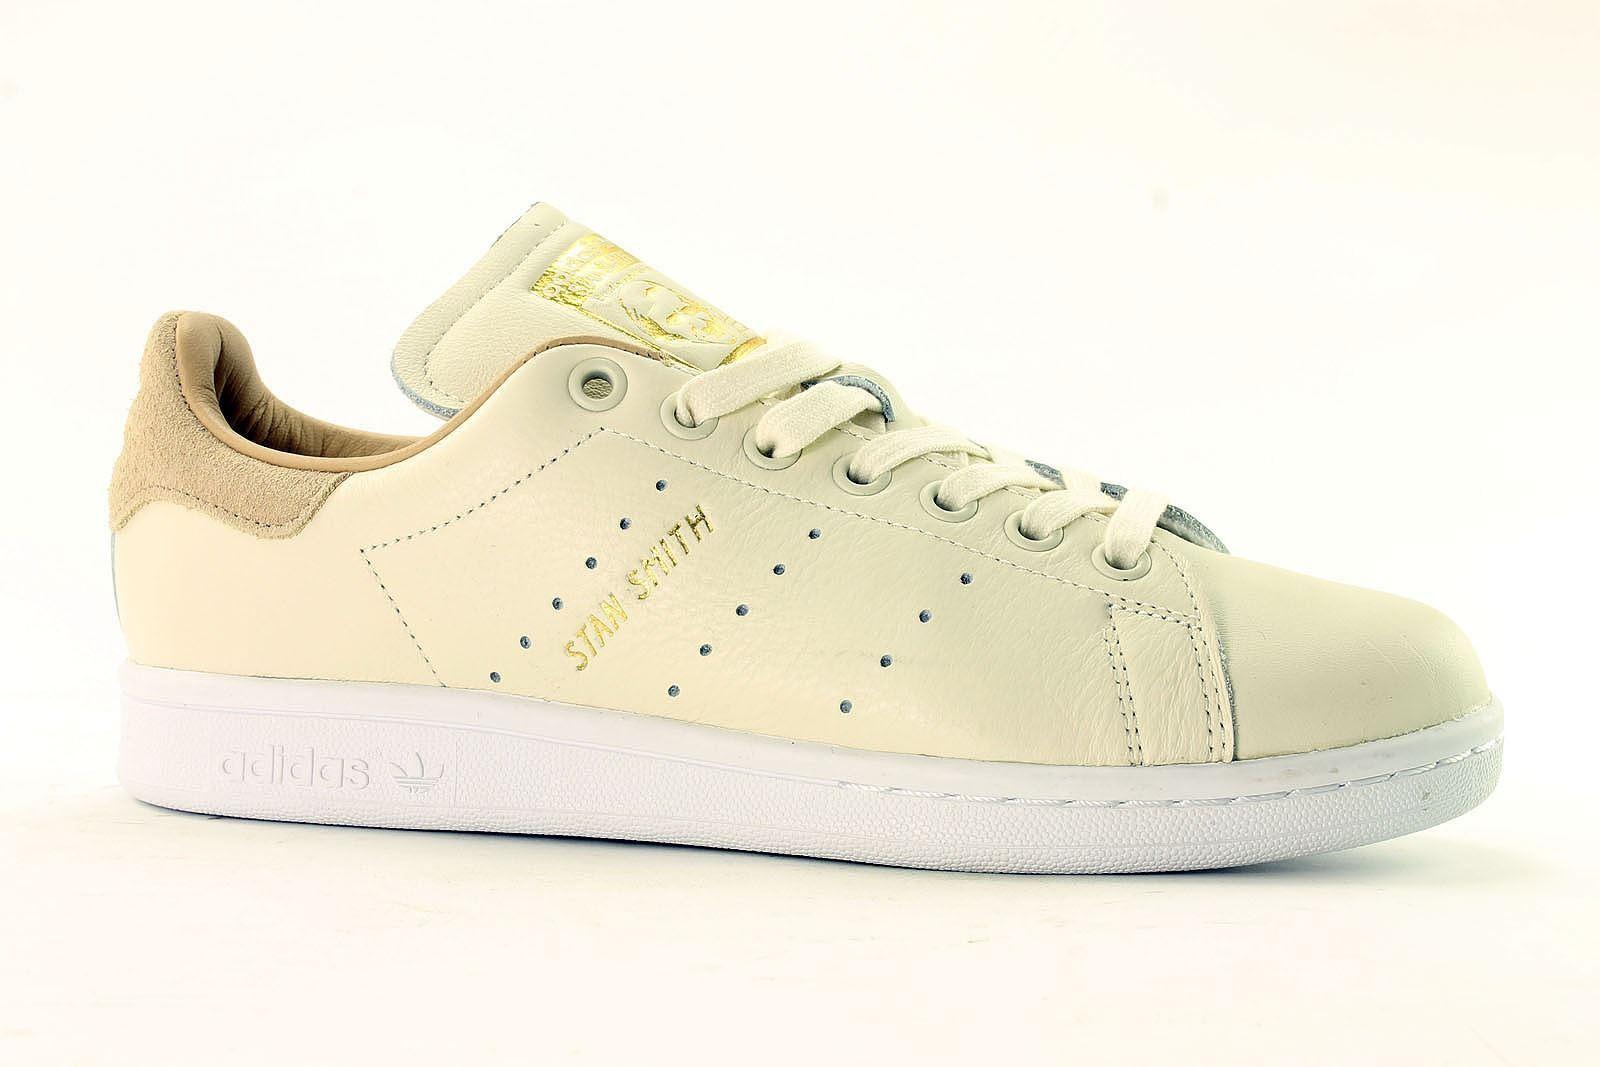 Adidas Stan Smith BB5165 Femme Baskets  Originals  UK 3.5 To 7 Seulement